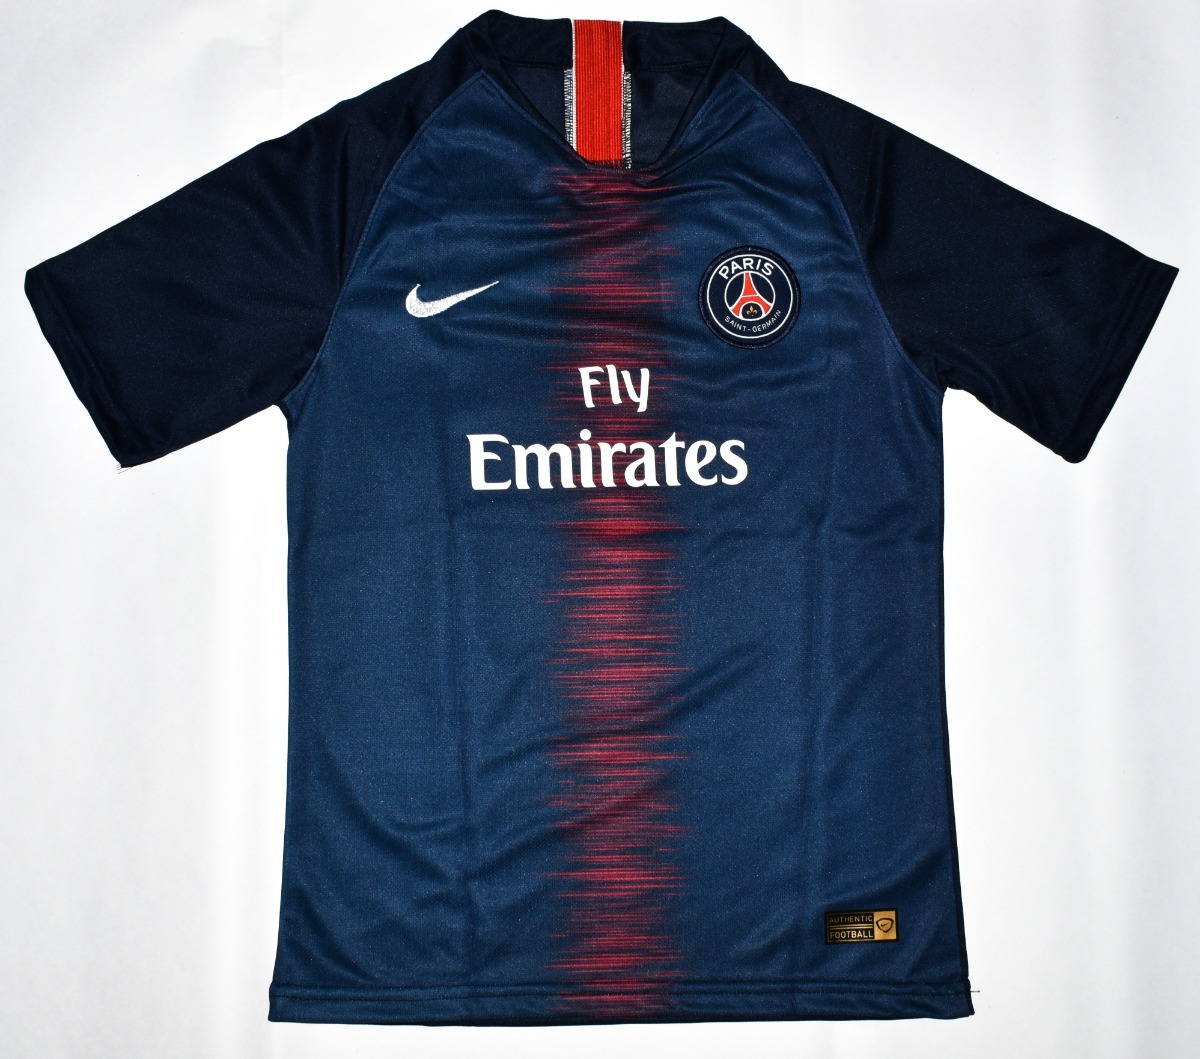 Nueva Camiseta Psg P  Niños Temporada 2018 2019 -   350 e50170ef645d8